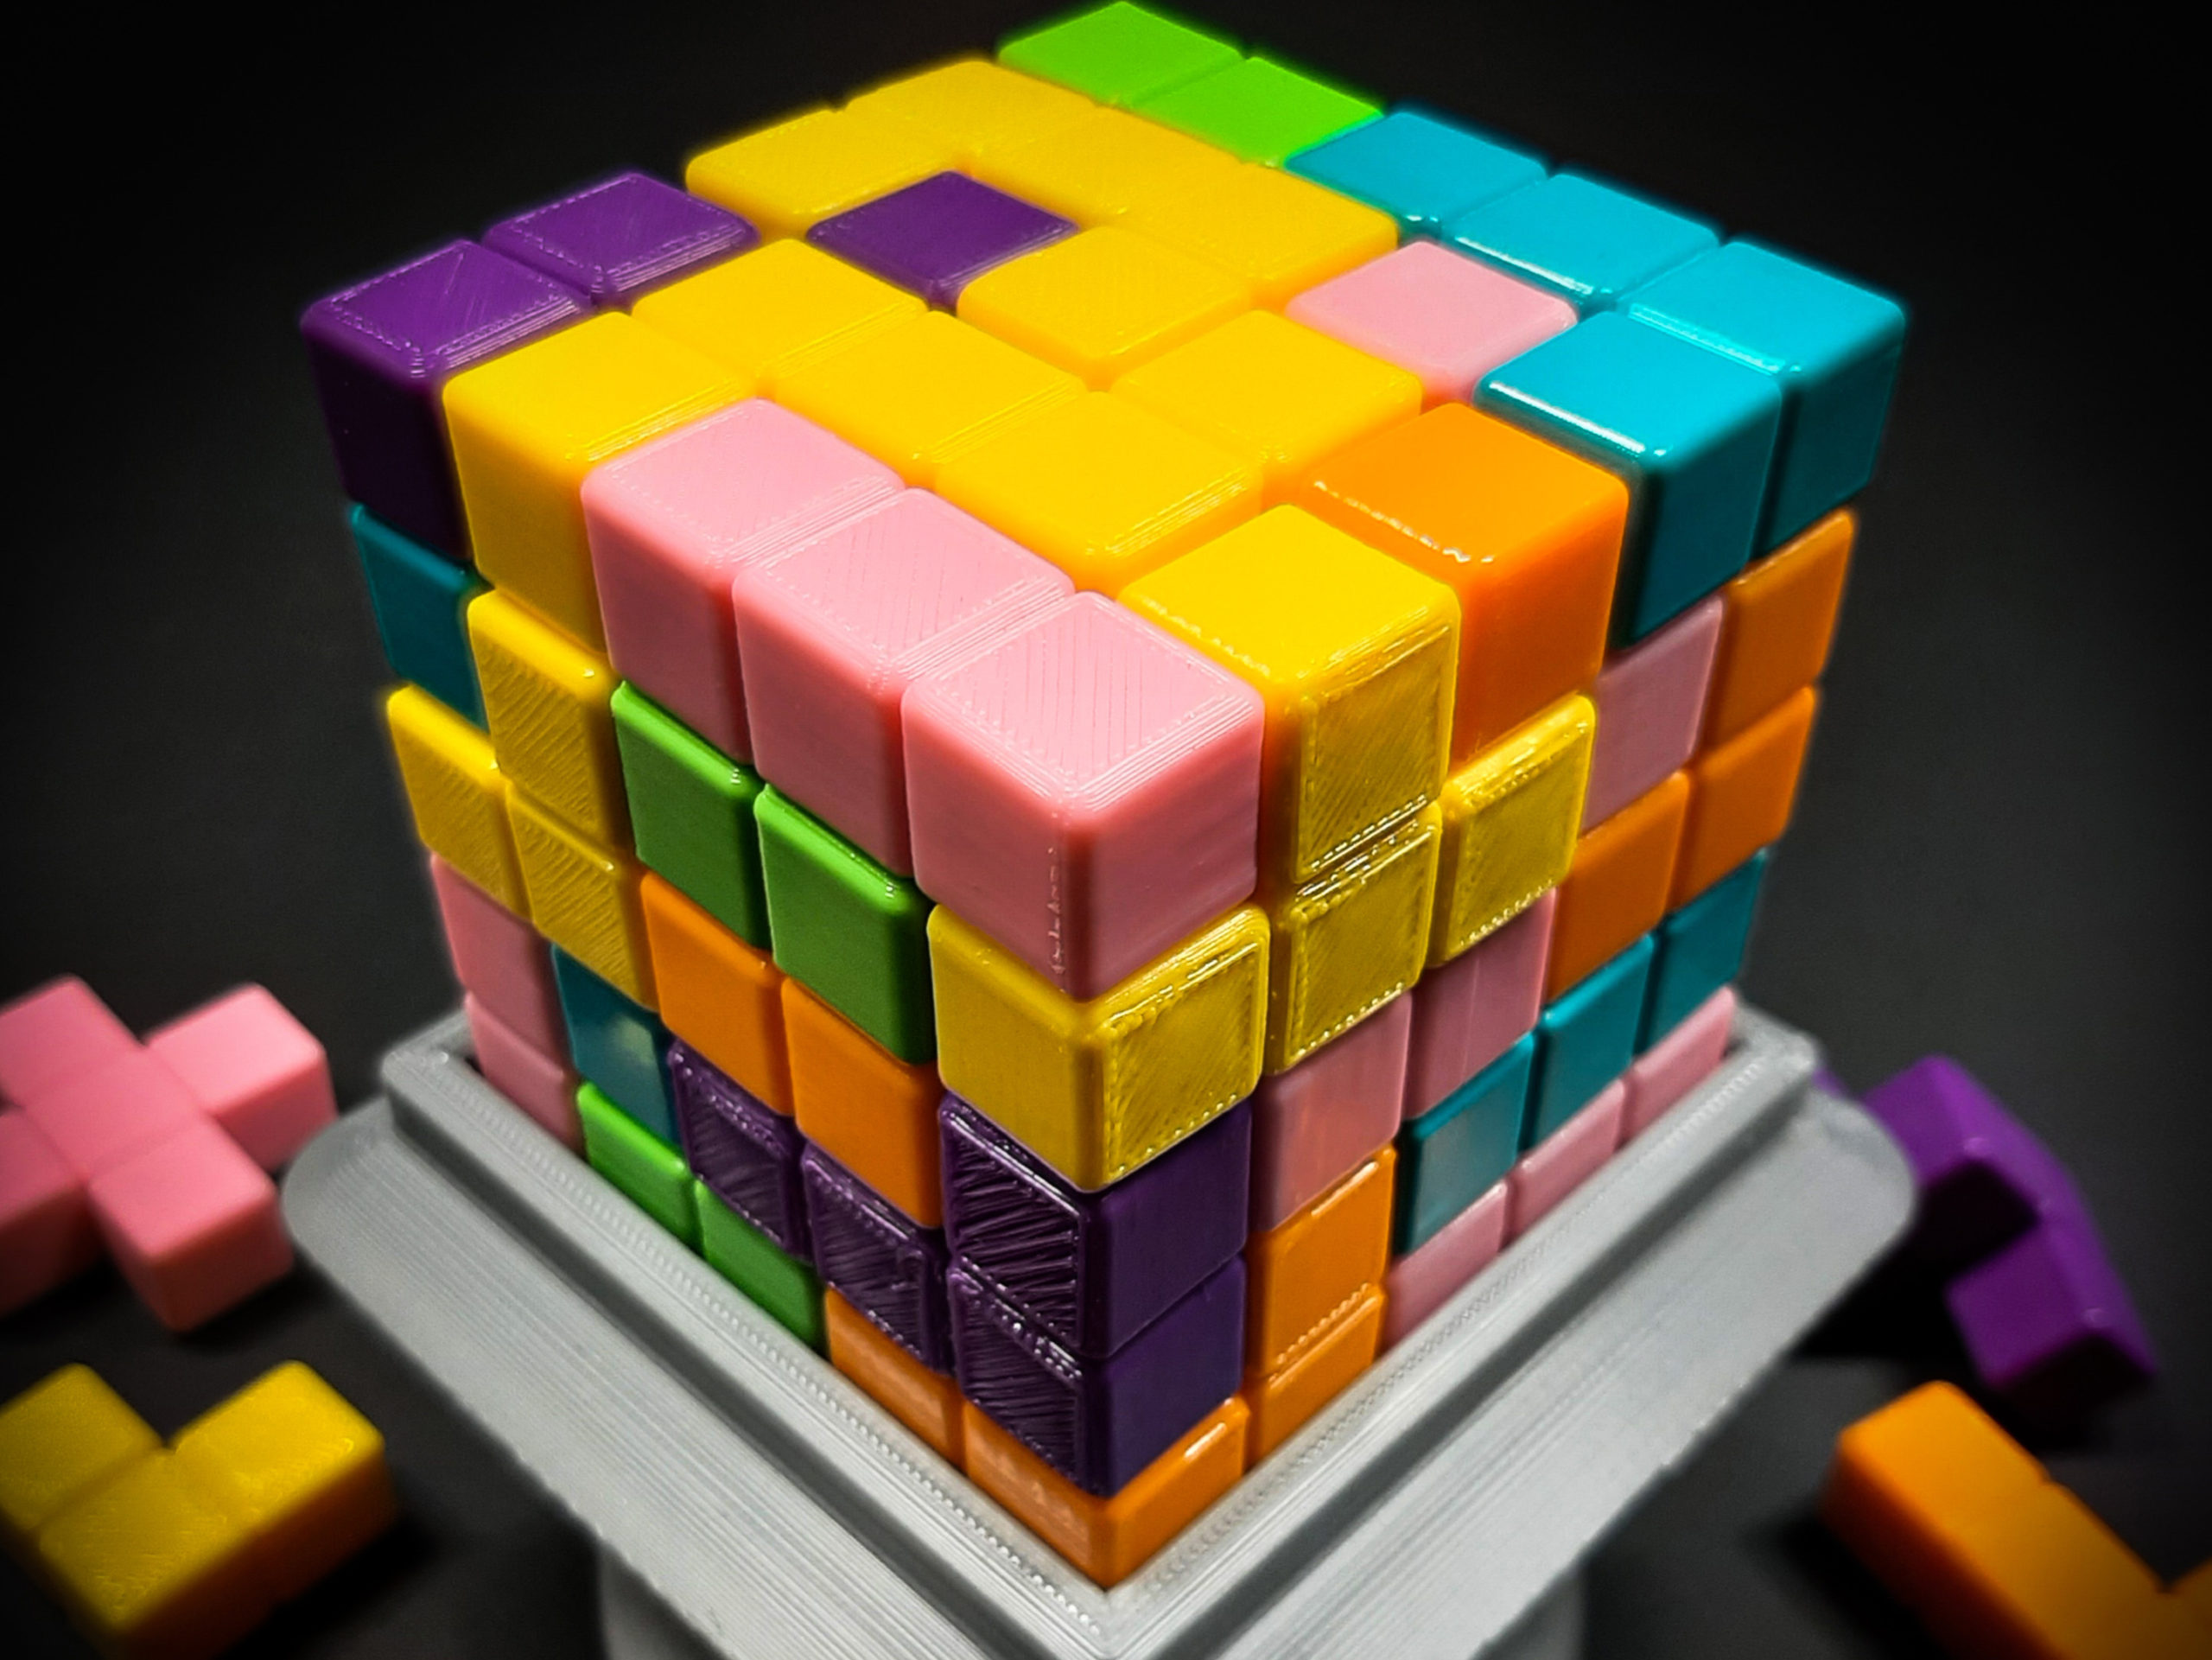 Blokk! Build the perfect cube